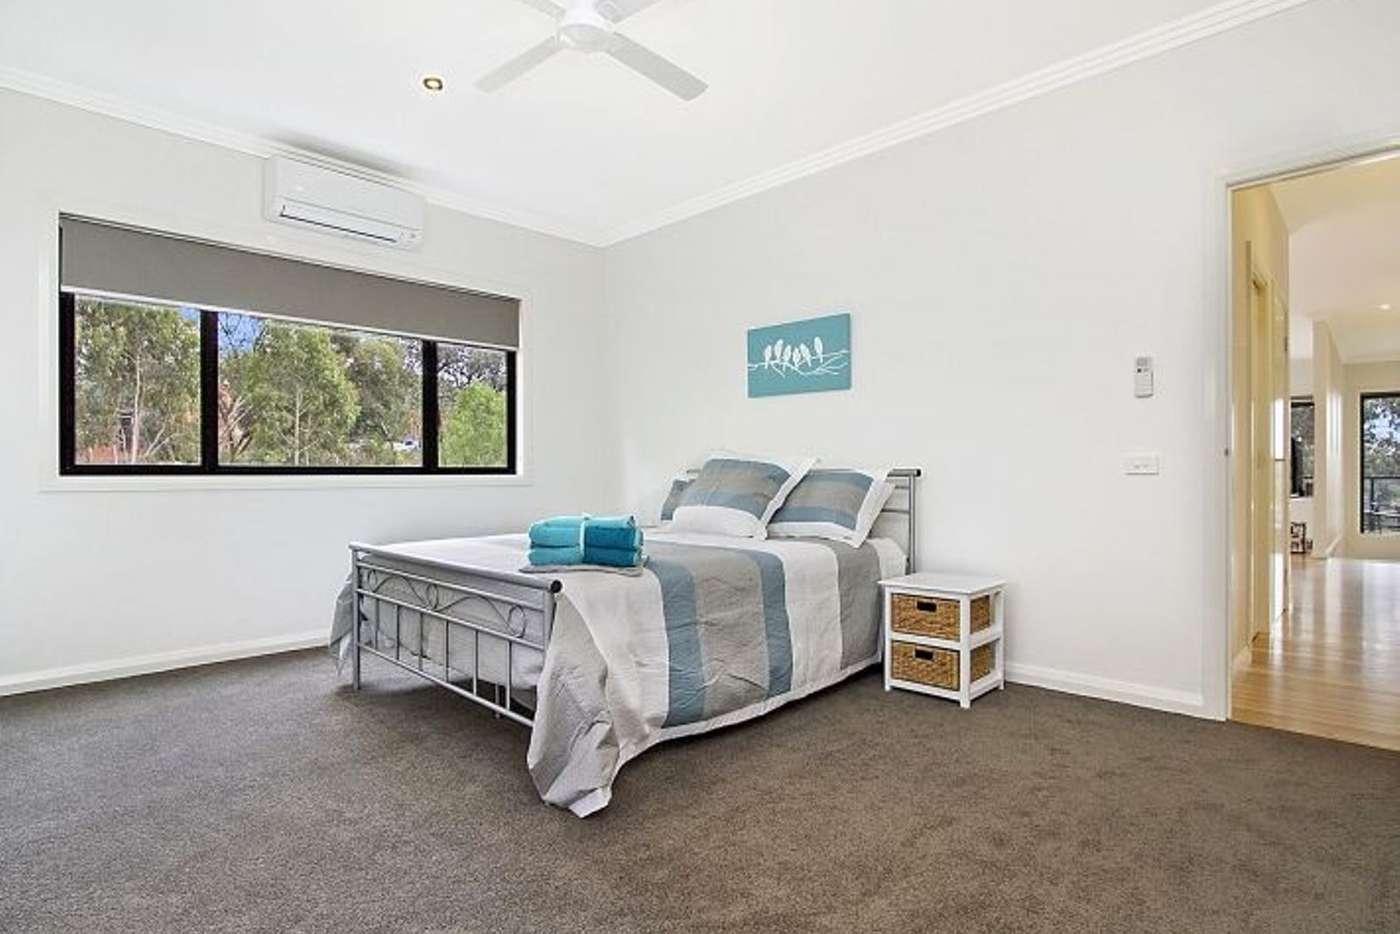 Sixth view of Homely house listing, 2/15 Abbott Street, Bendigo VIC 3550